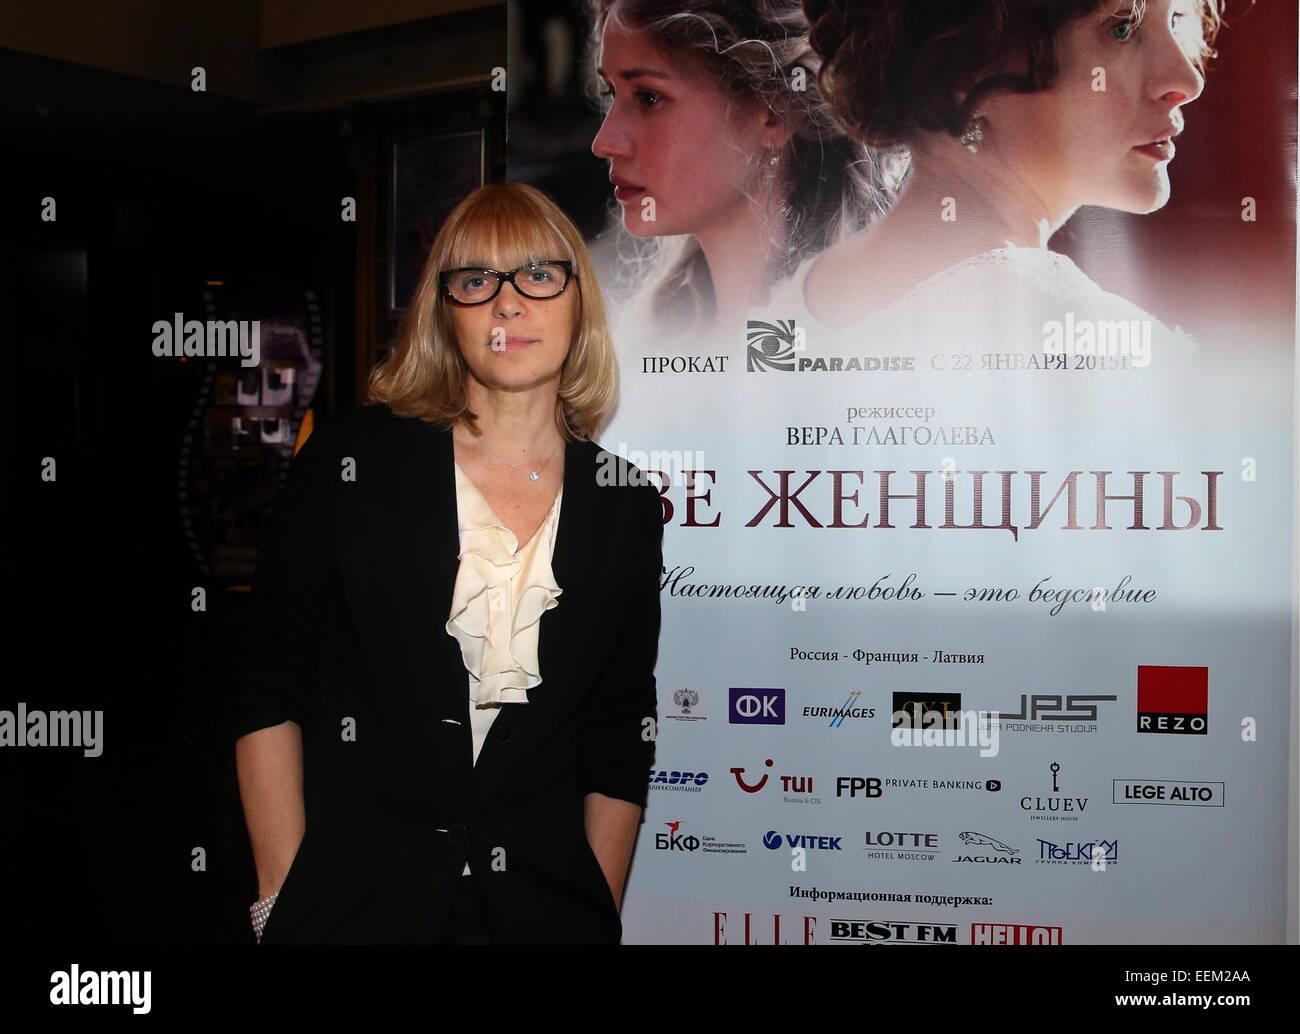 Russian actress Vera Glagoleva died 50